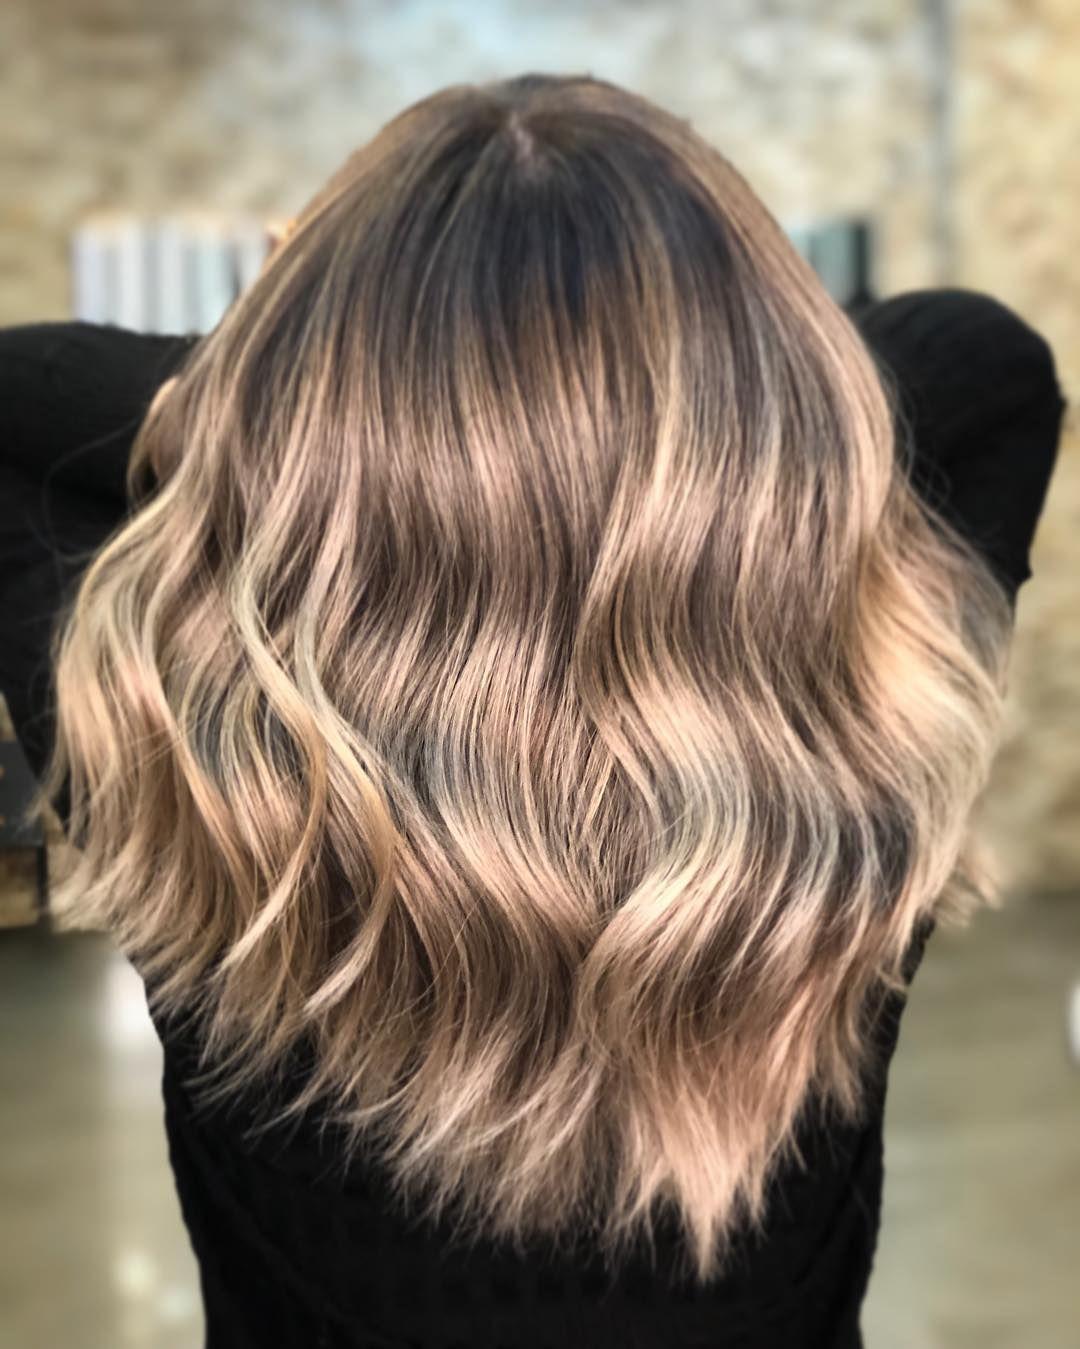 Hair Haircut Rofle Balyaj Ombre Highlights Brushlight Etiler Nisantasi Kadikoy Levent Longhair Bahcesehir Sacmodeller Balyaj Sac Sac Kesimi